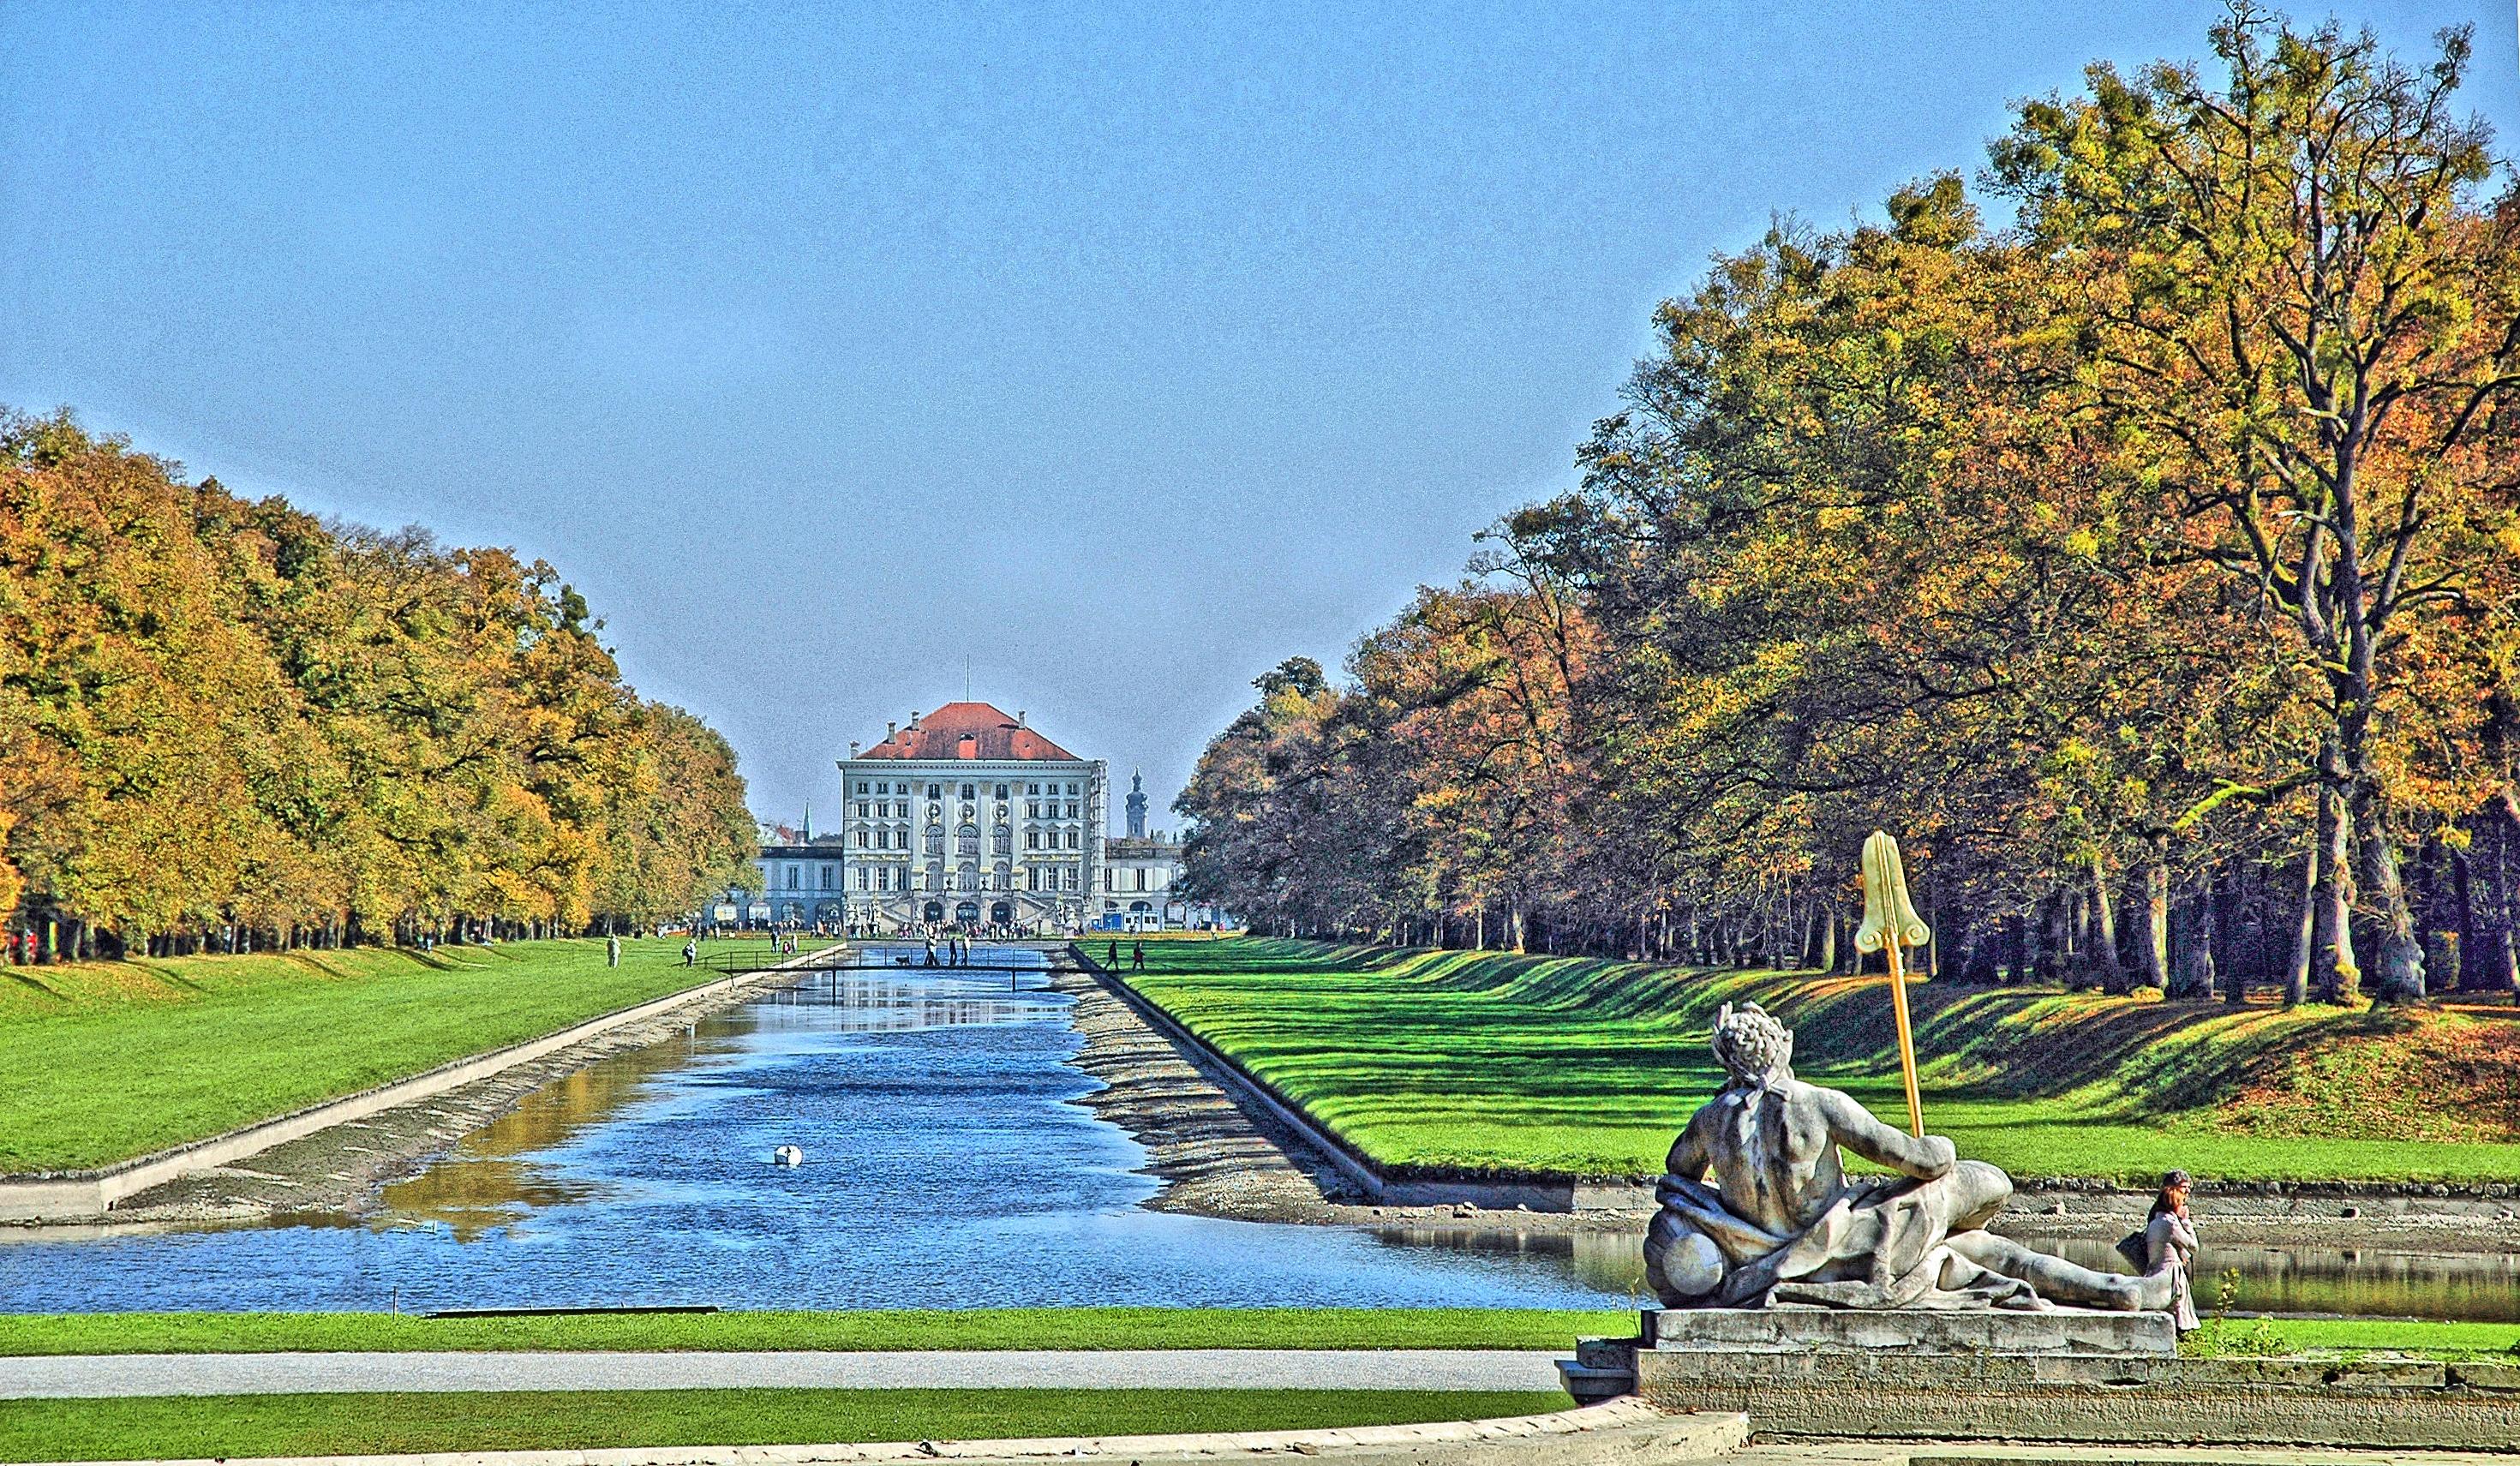 File:München - Schloss Nymphenburg Park (tone-mapping).jpg ...